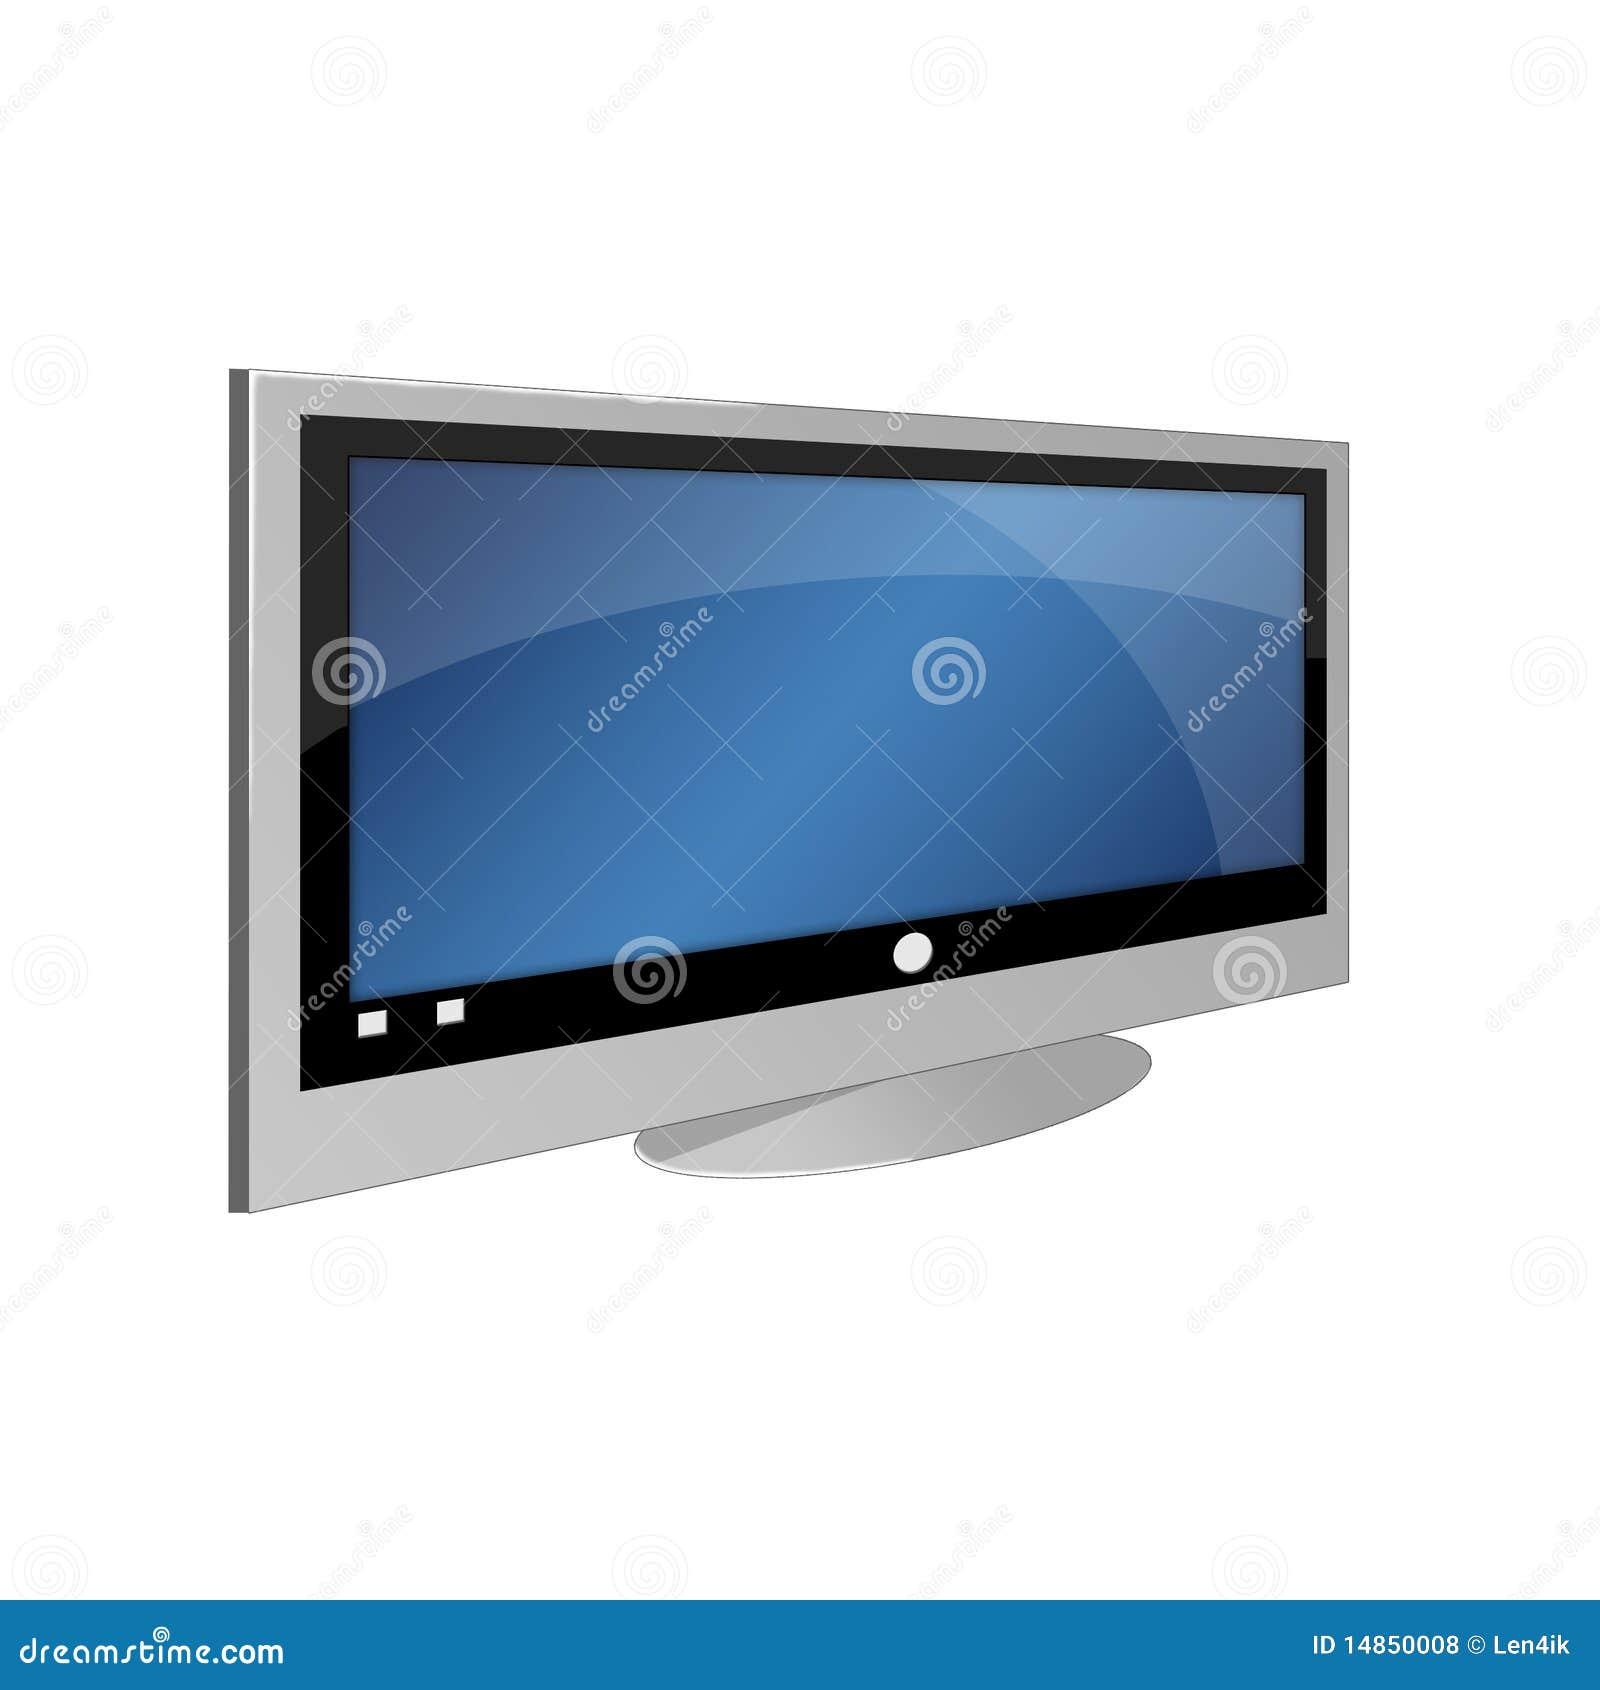 Big TV on white background